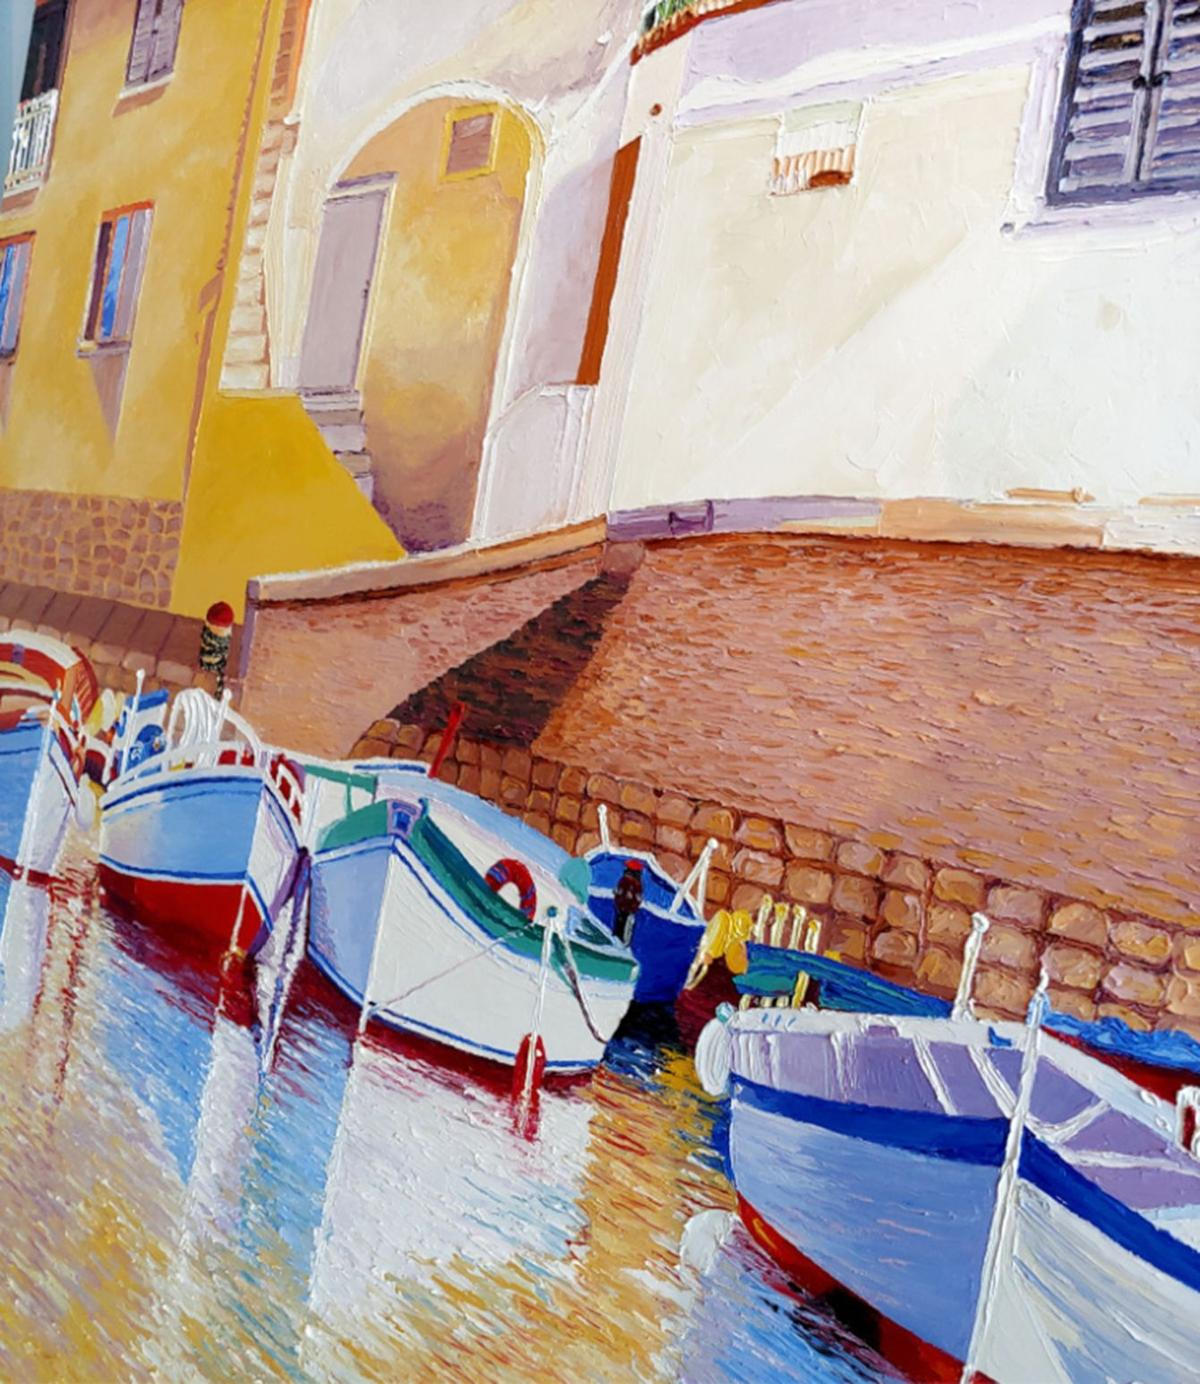 052119_MNS_Dakoro_exhibit_001 Diana Manole painting